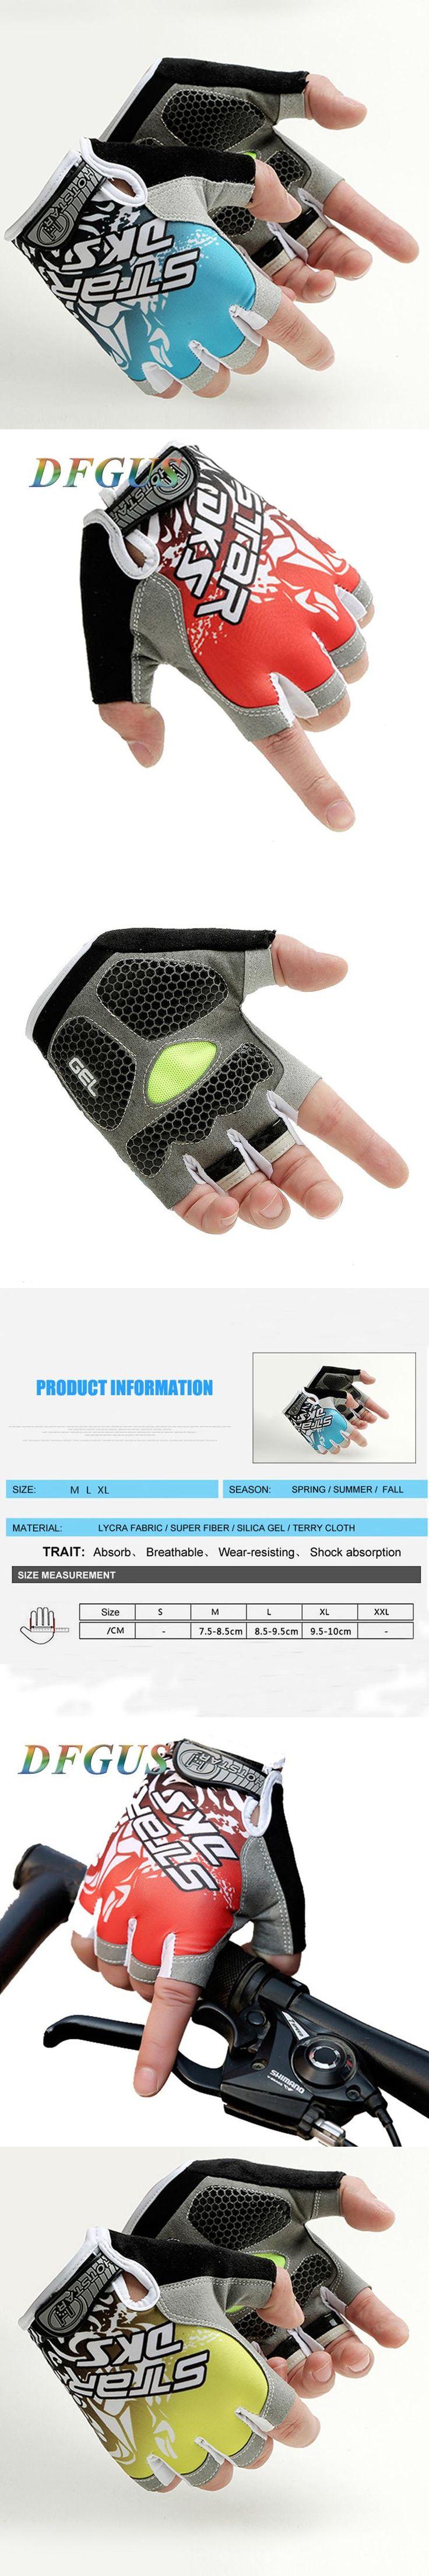 Men Fitness Gym Glove Weight Lifting Gloves Women Half Finger Body Building Sports Training Luva Outdoor Ridding Gloves